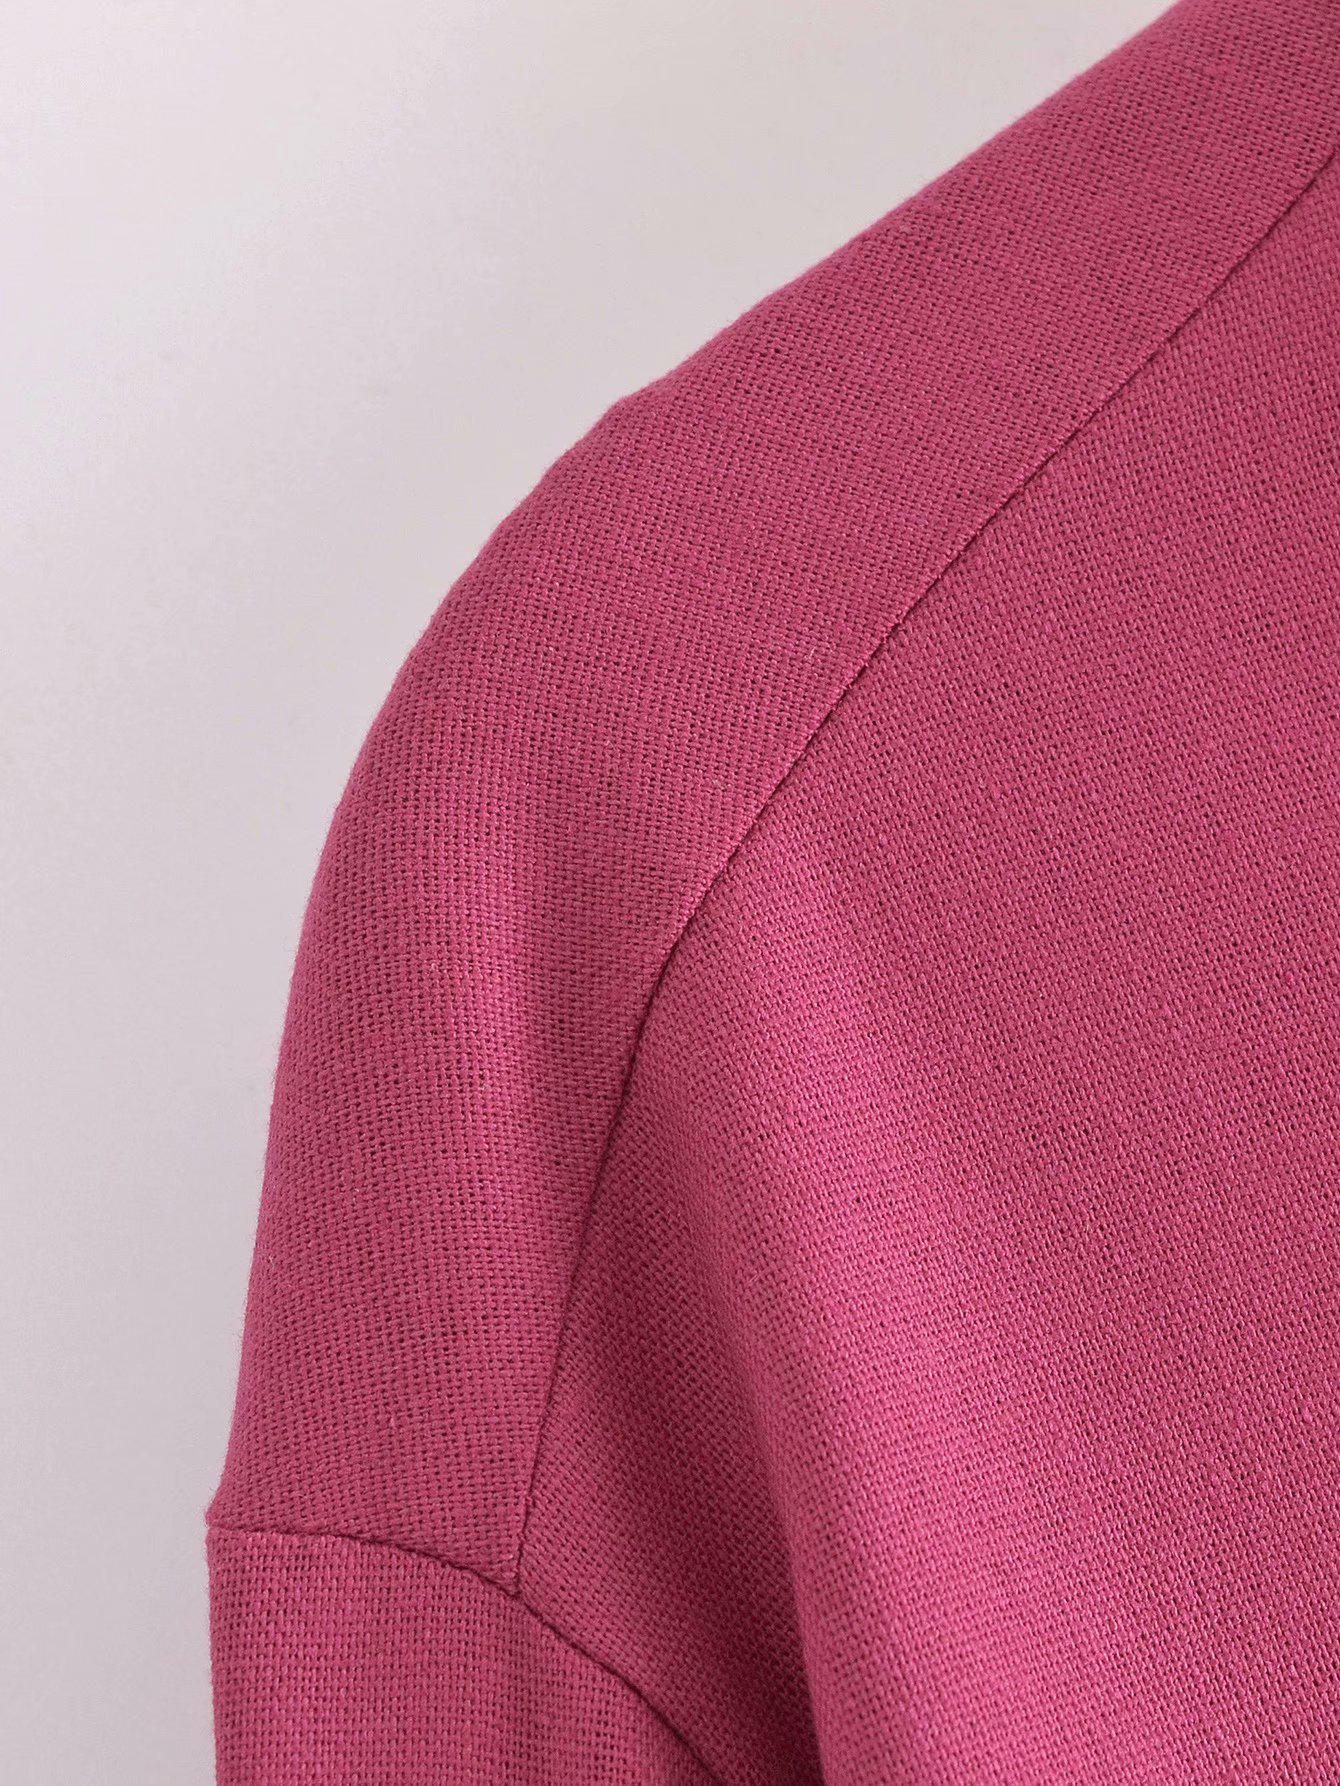 Turndown Collar Solid Women Long Sleeve Blouse